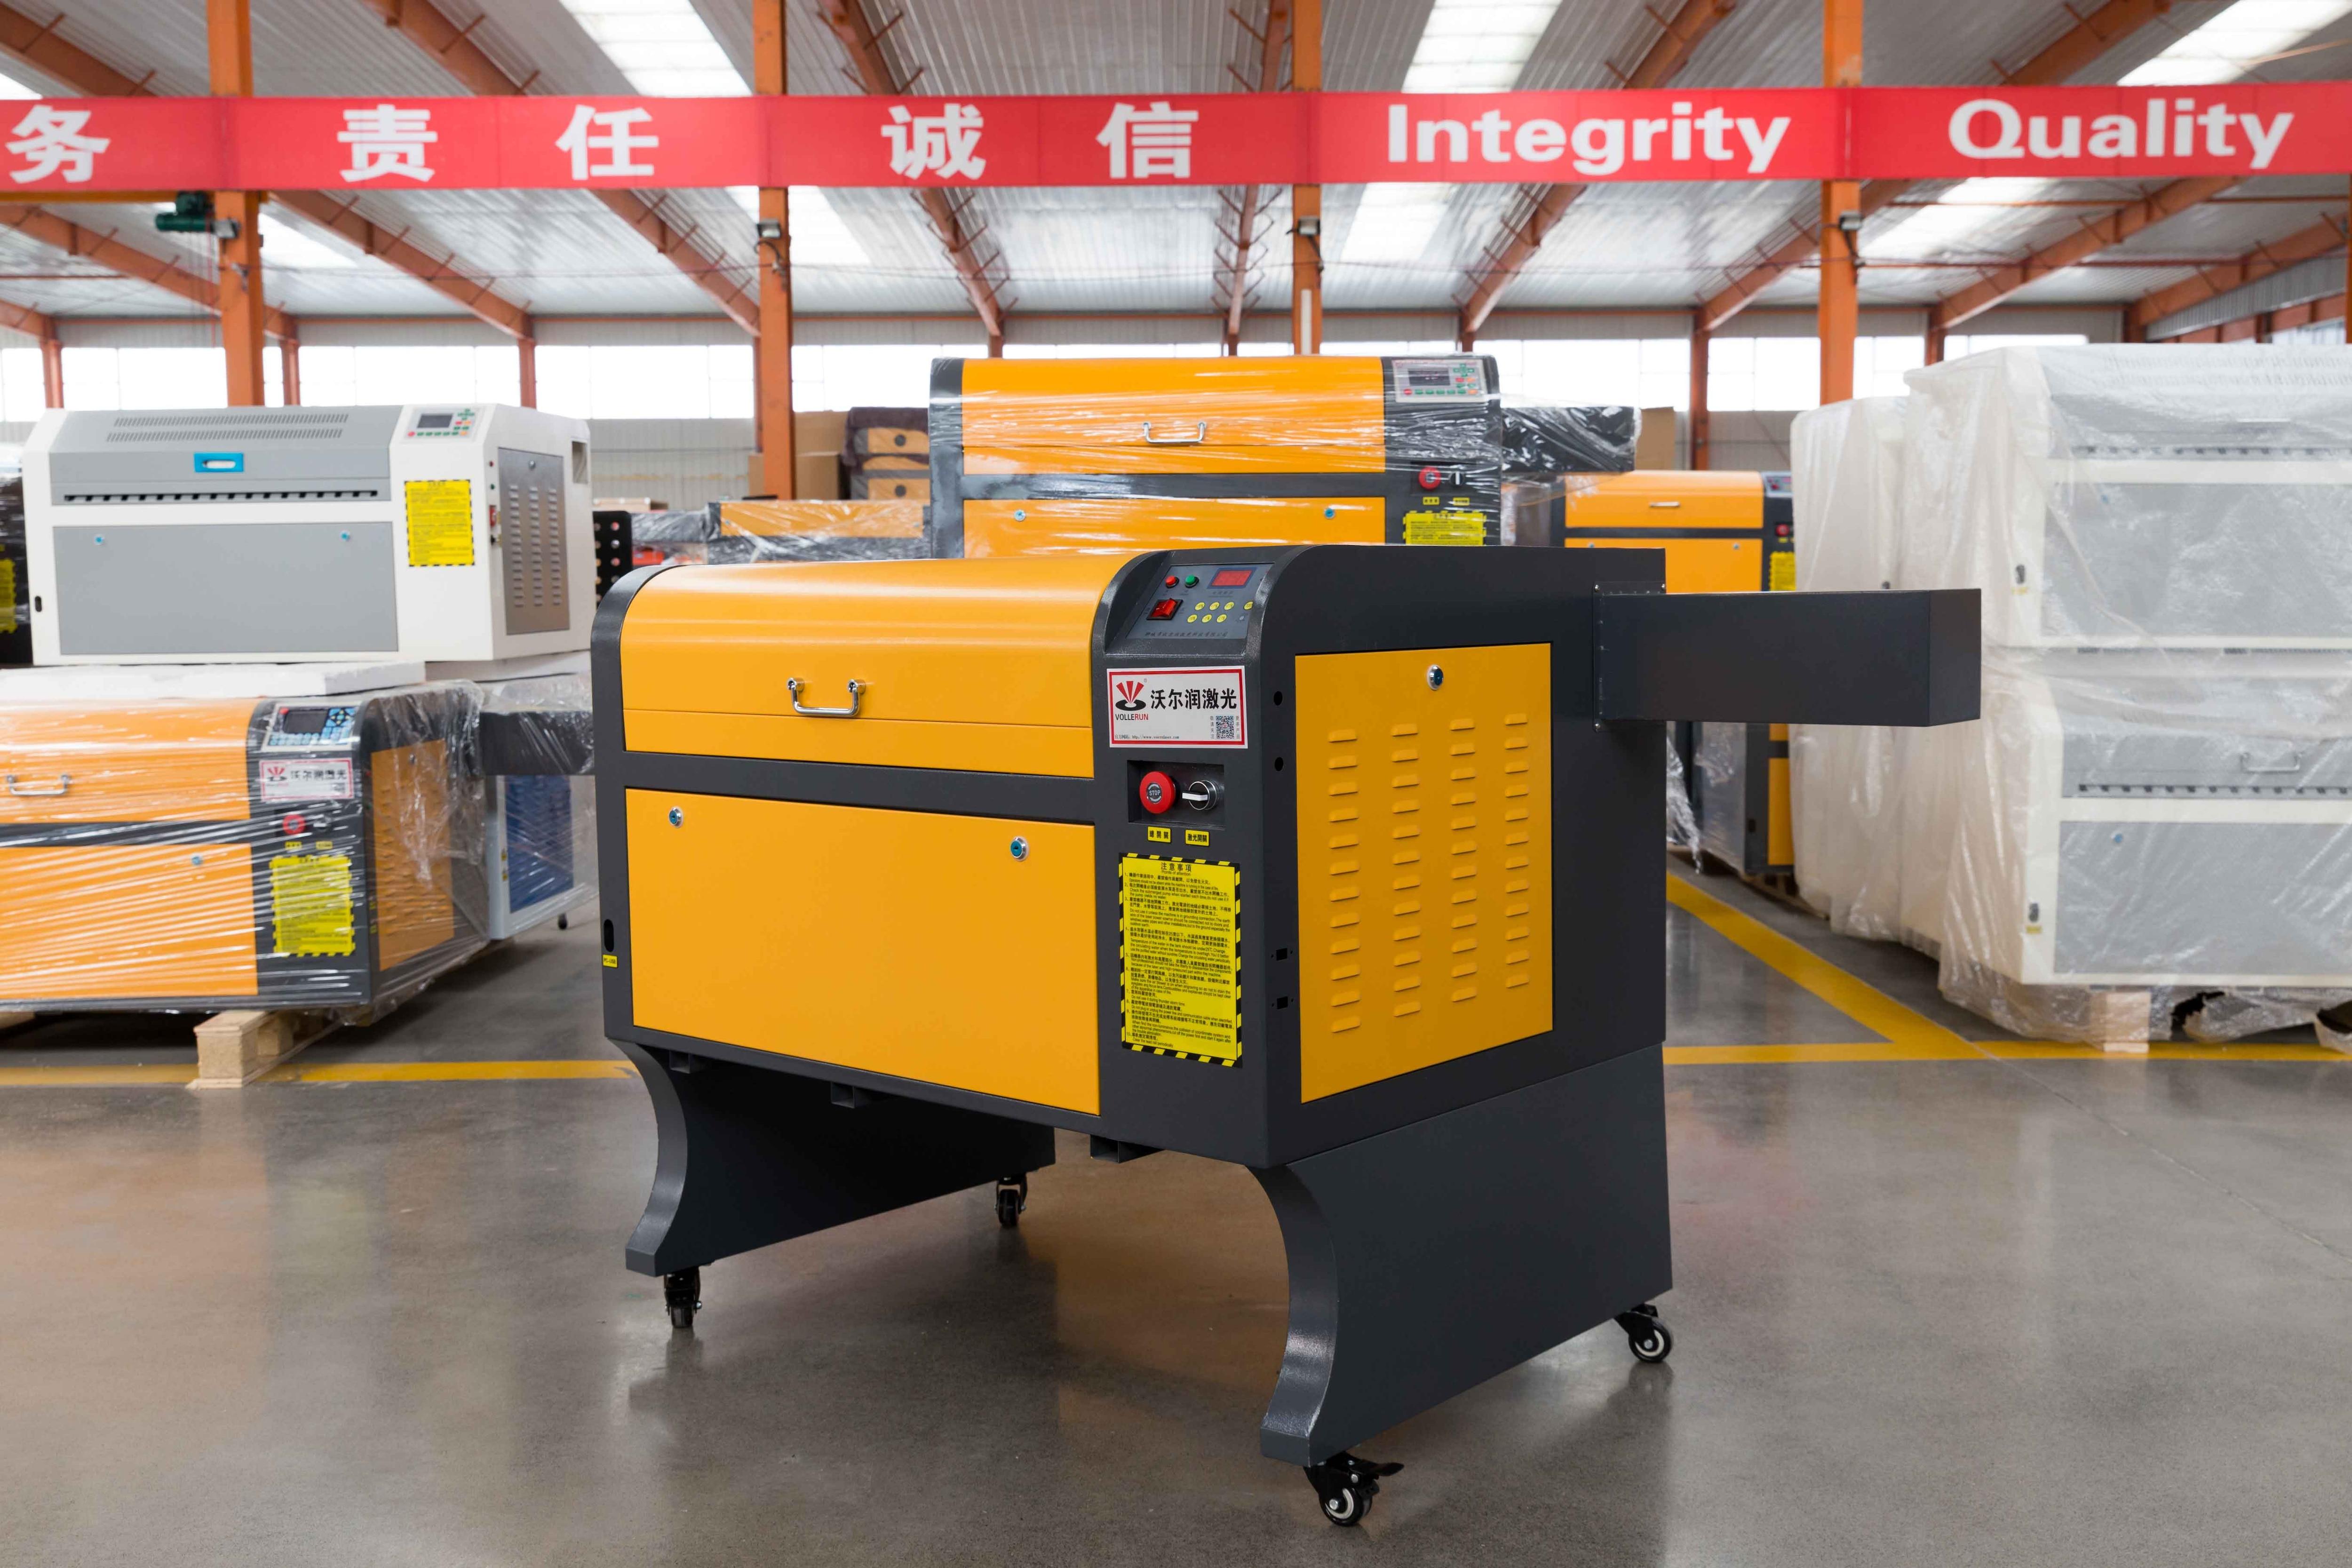 VOIERN 50W-M2 WR4060 co2 laser machine de gravure 220 v/110 v laser machine de découpe bricolage CNC gravure découpeuse